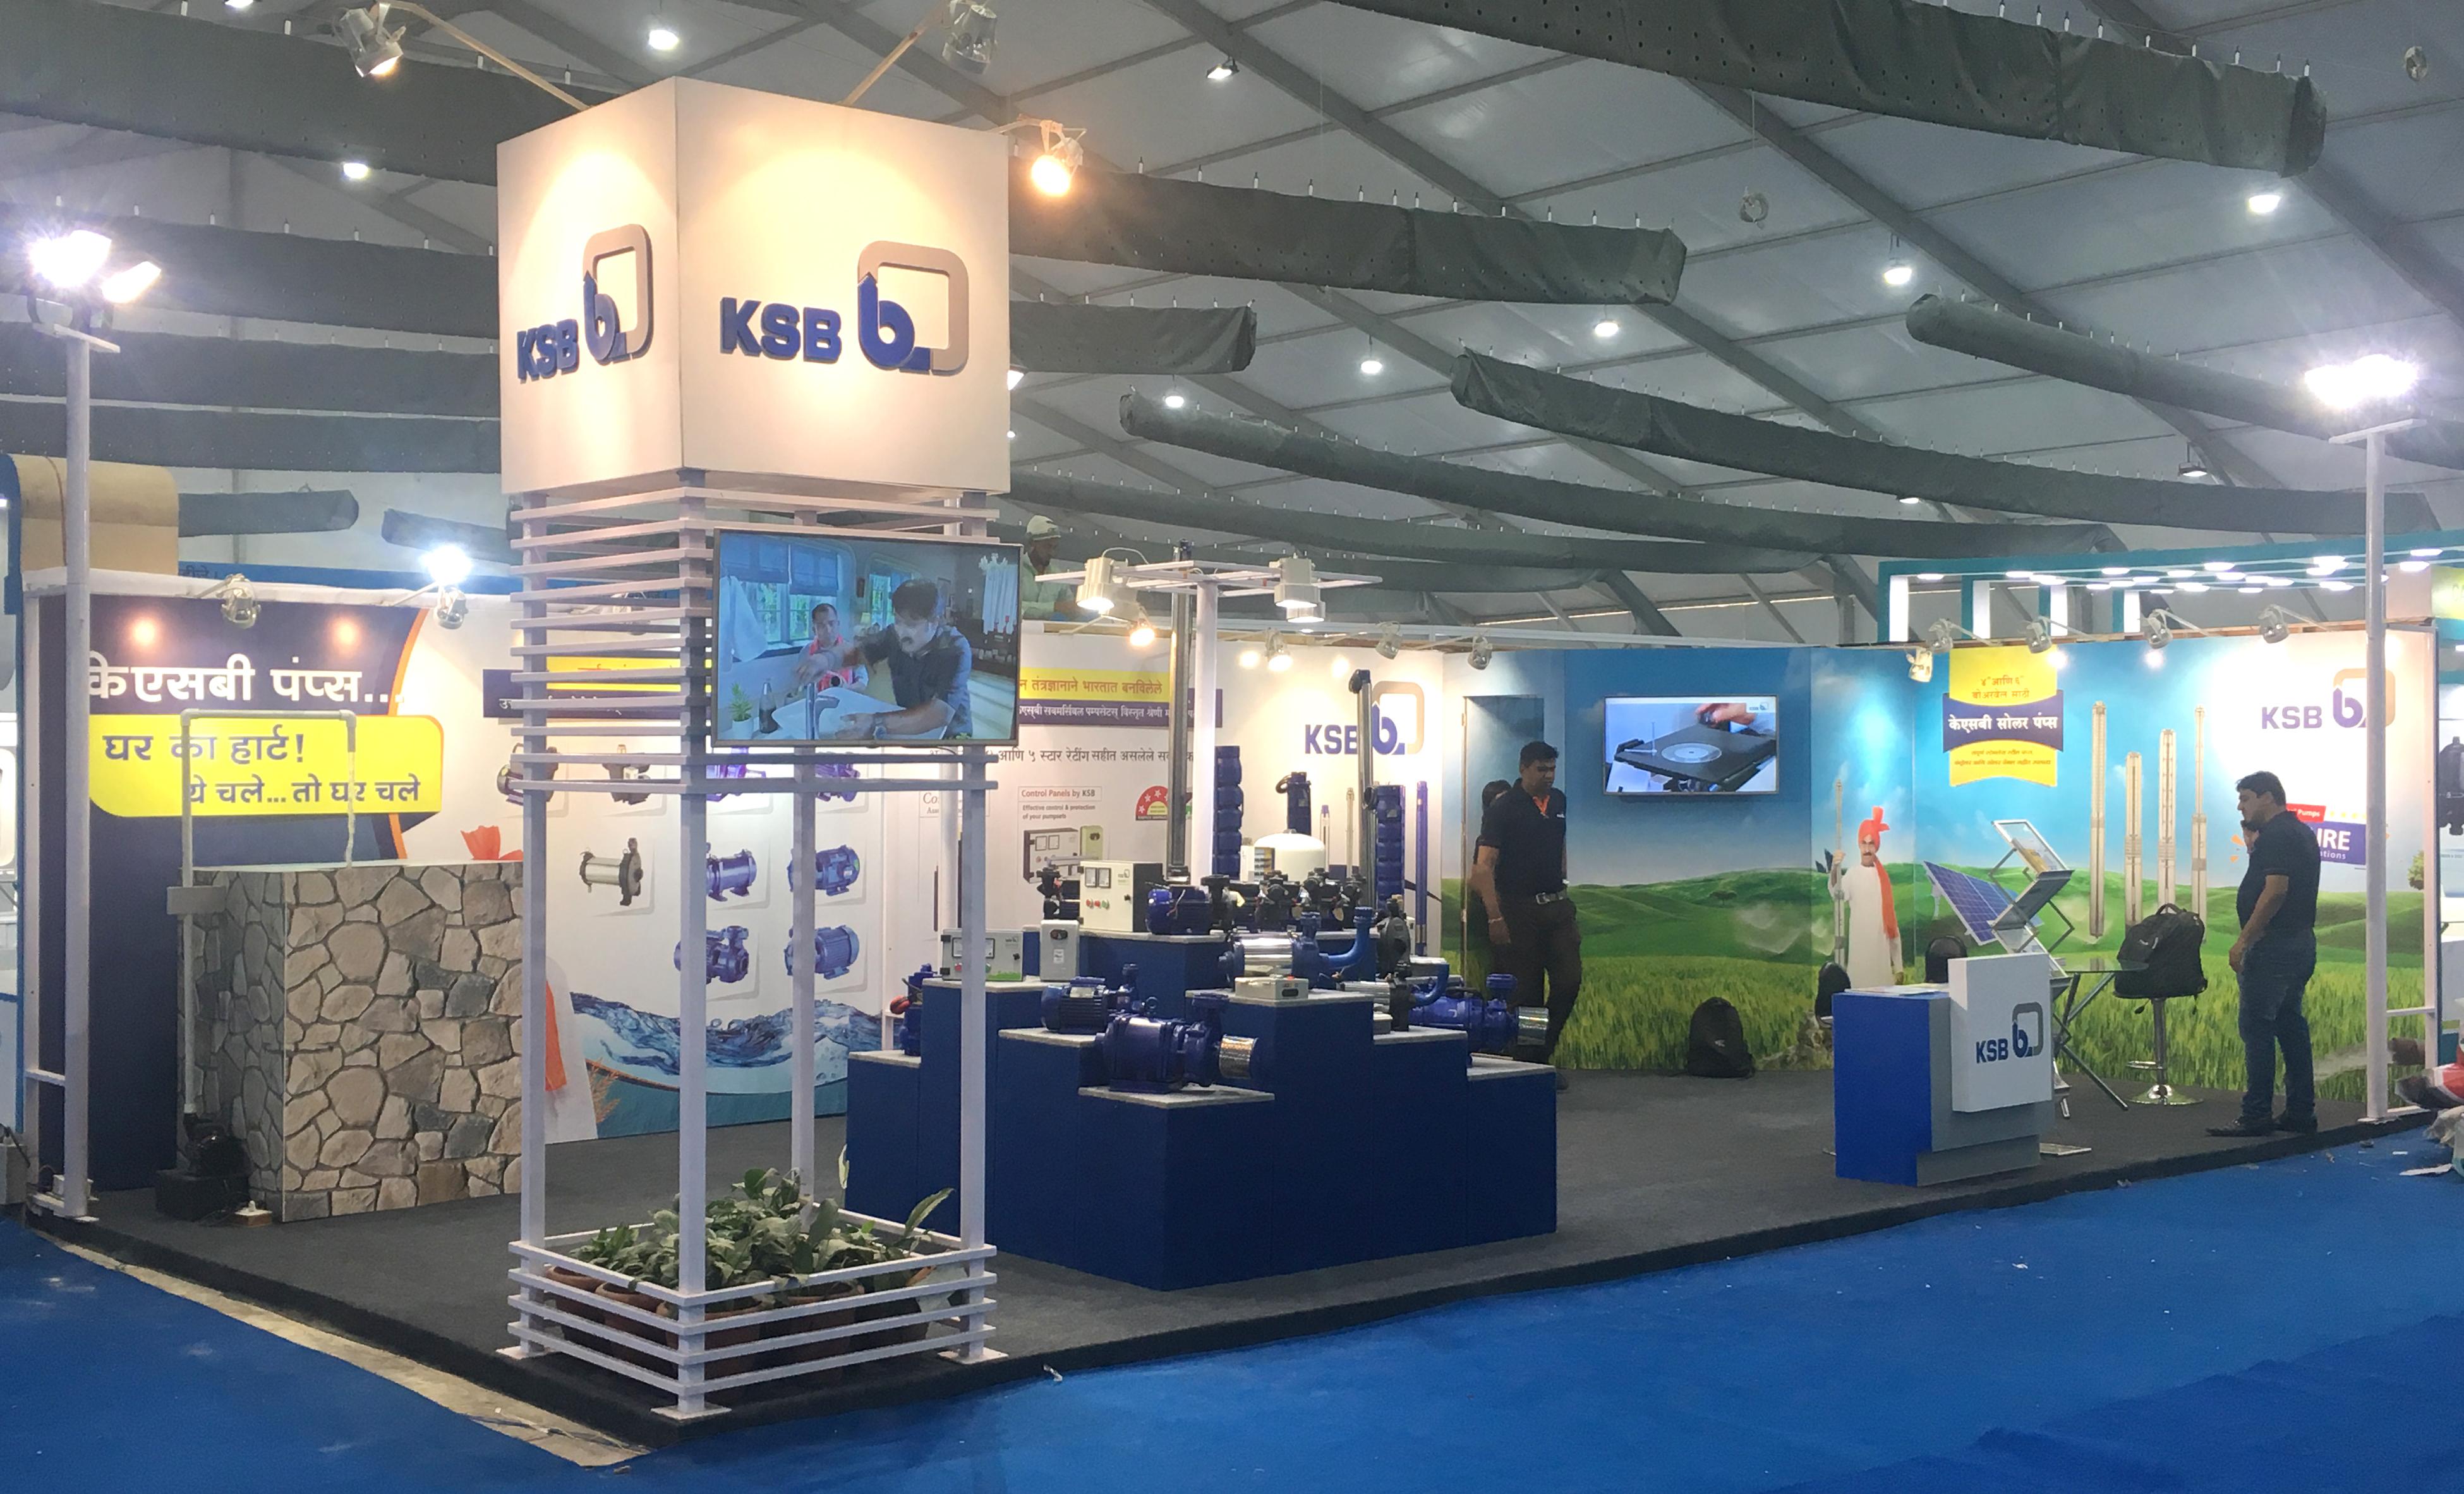 Exhibition Stall In Pune : Kisan 2018 in pune ksb